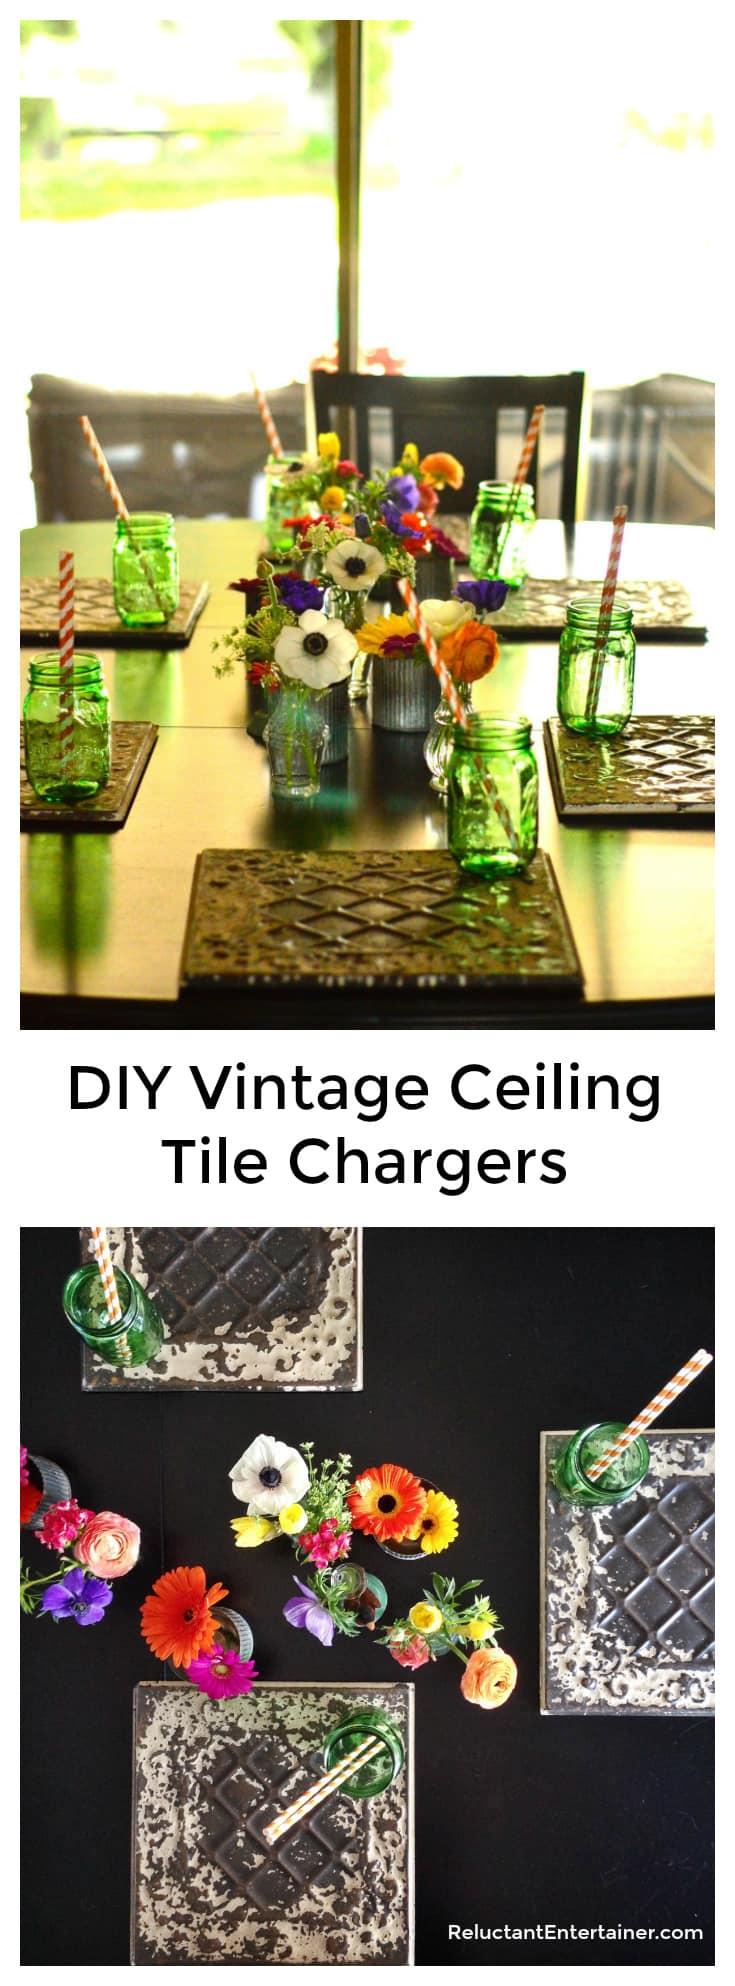 DIY Vintage Ceiling Tile Chargers